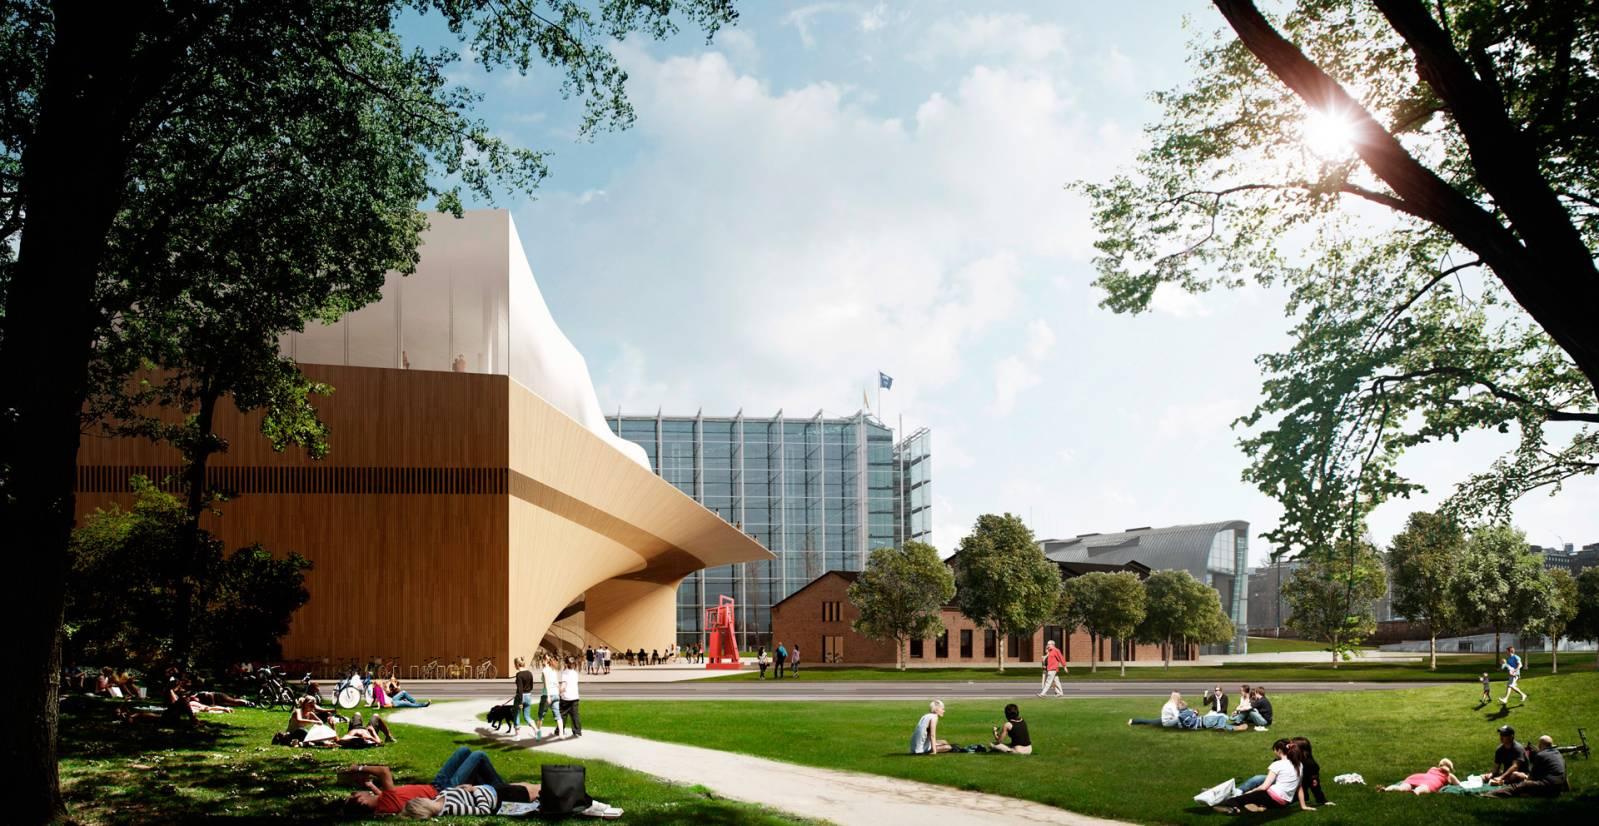 Helsinki Central Library